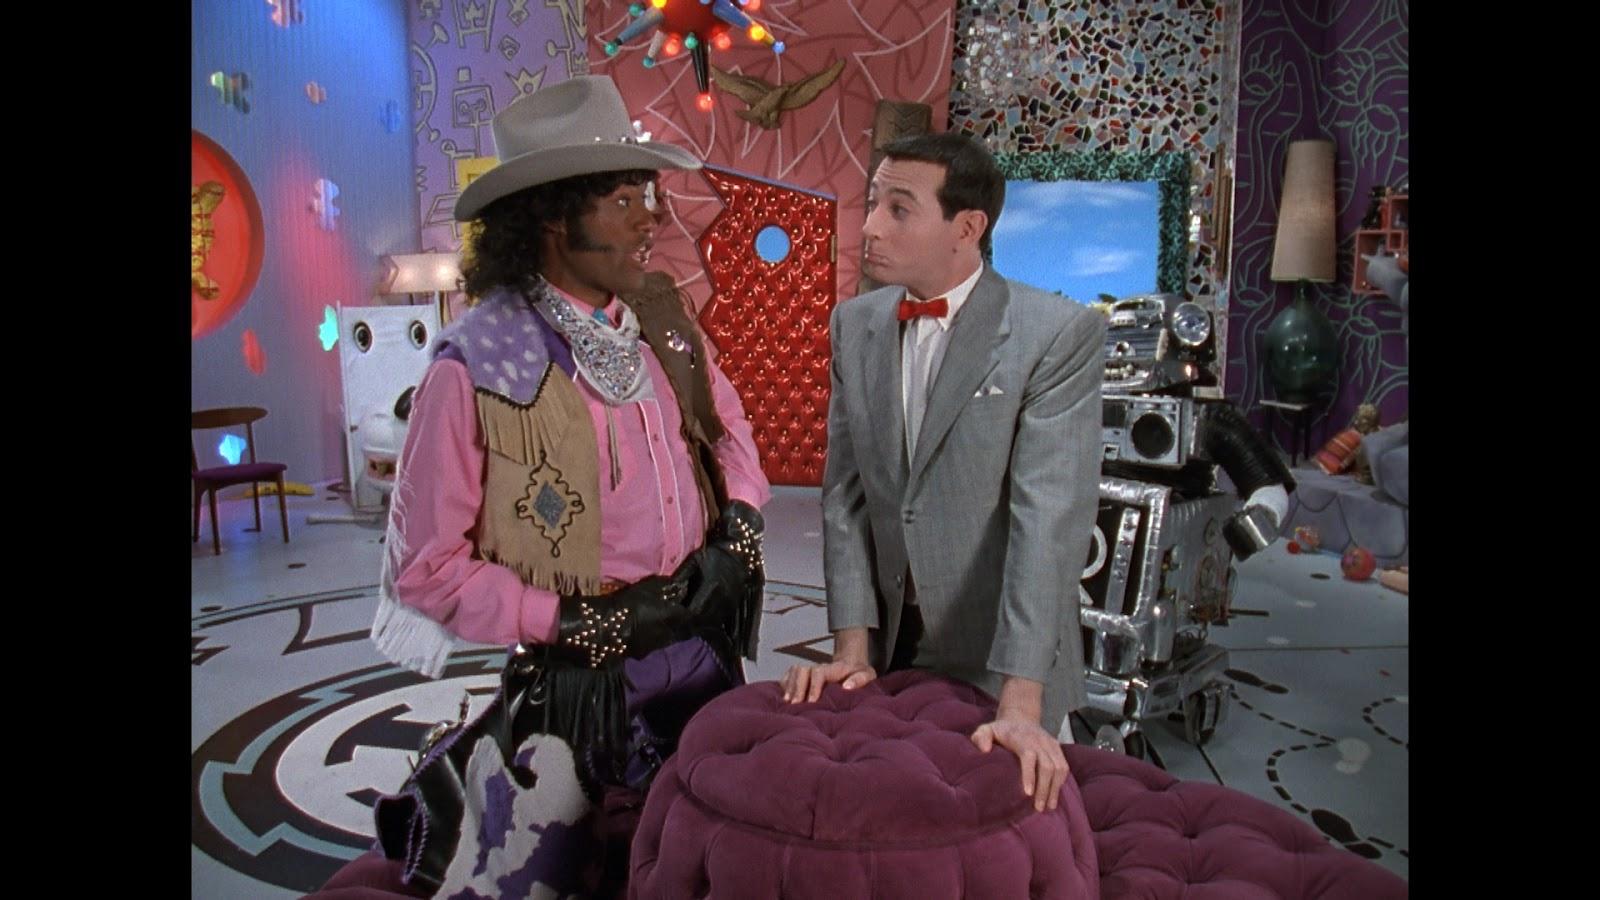 Cowboy Curtis - Pee Wees Playhouse - amazonde